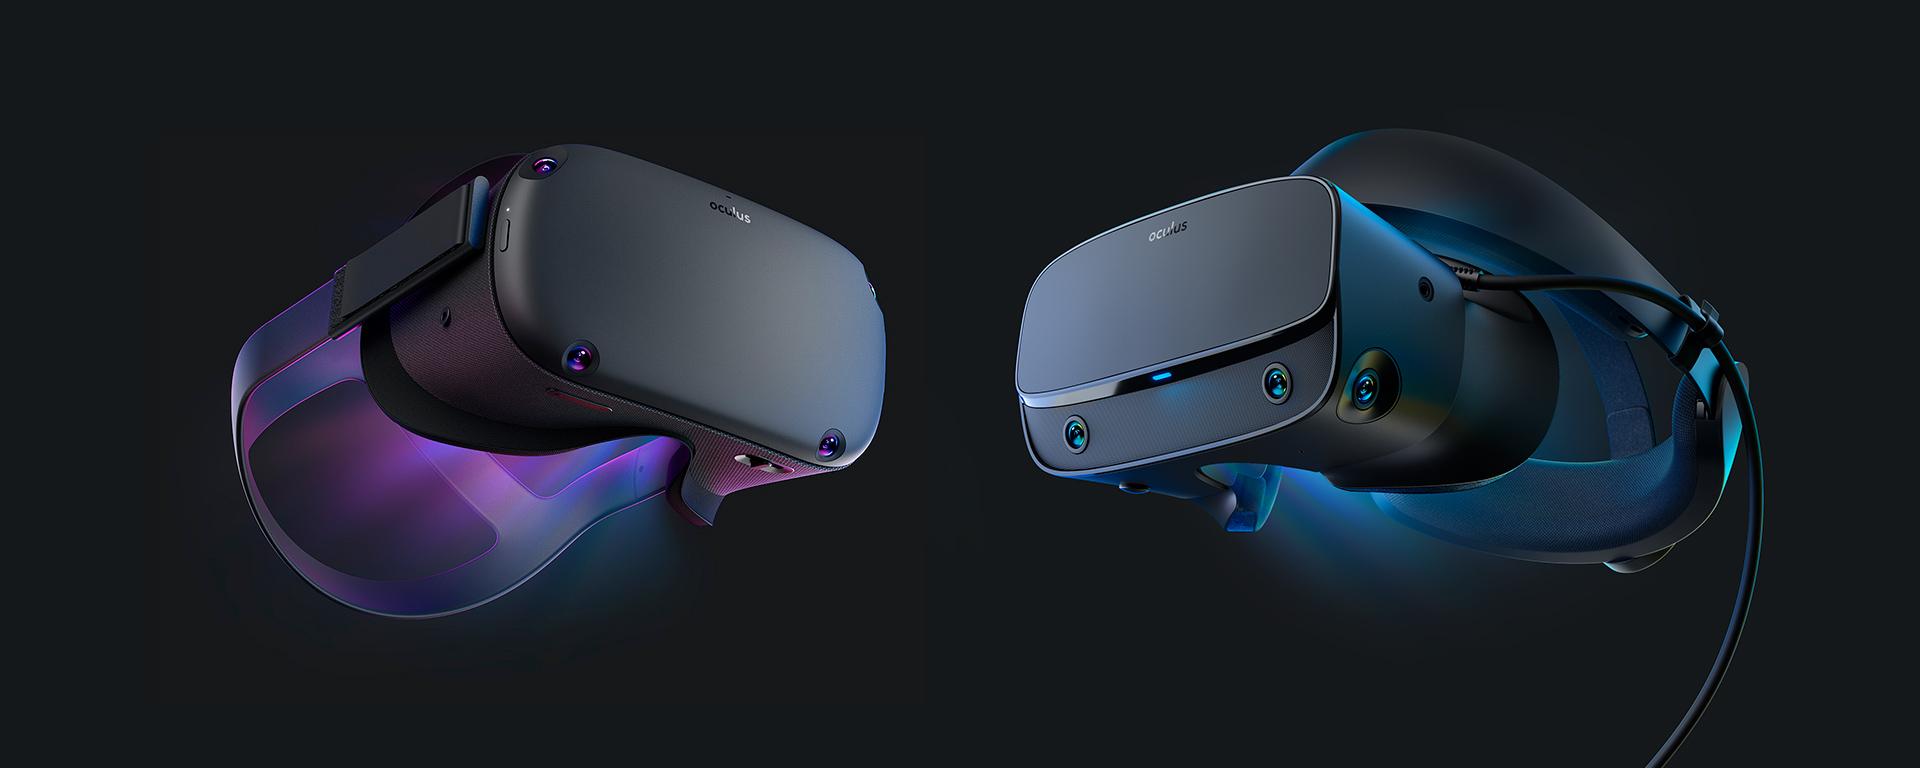 Oculus Quest vs Oculus Rift S